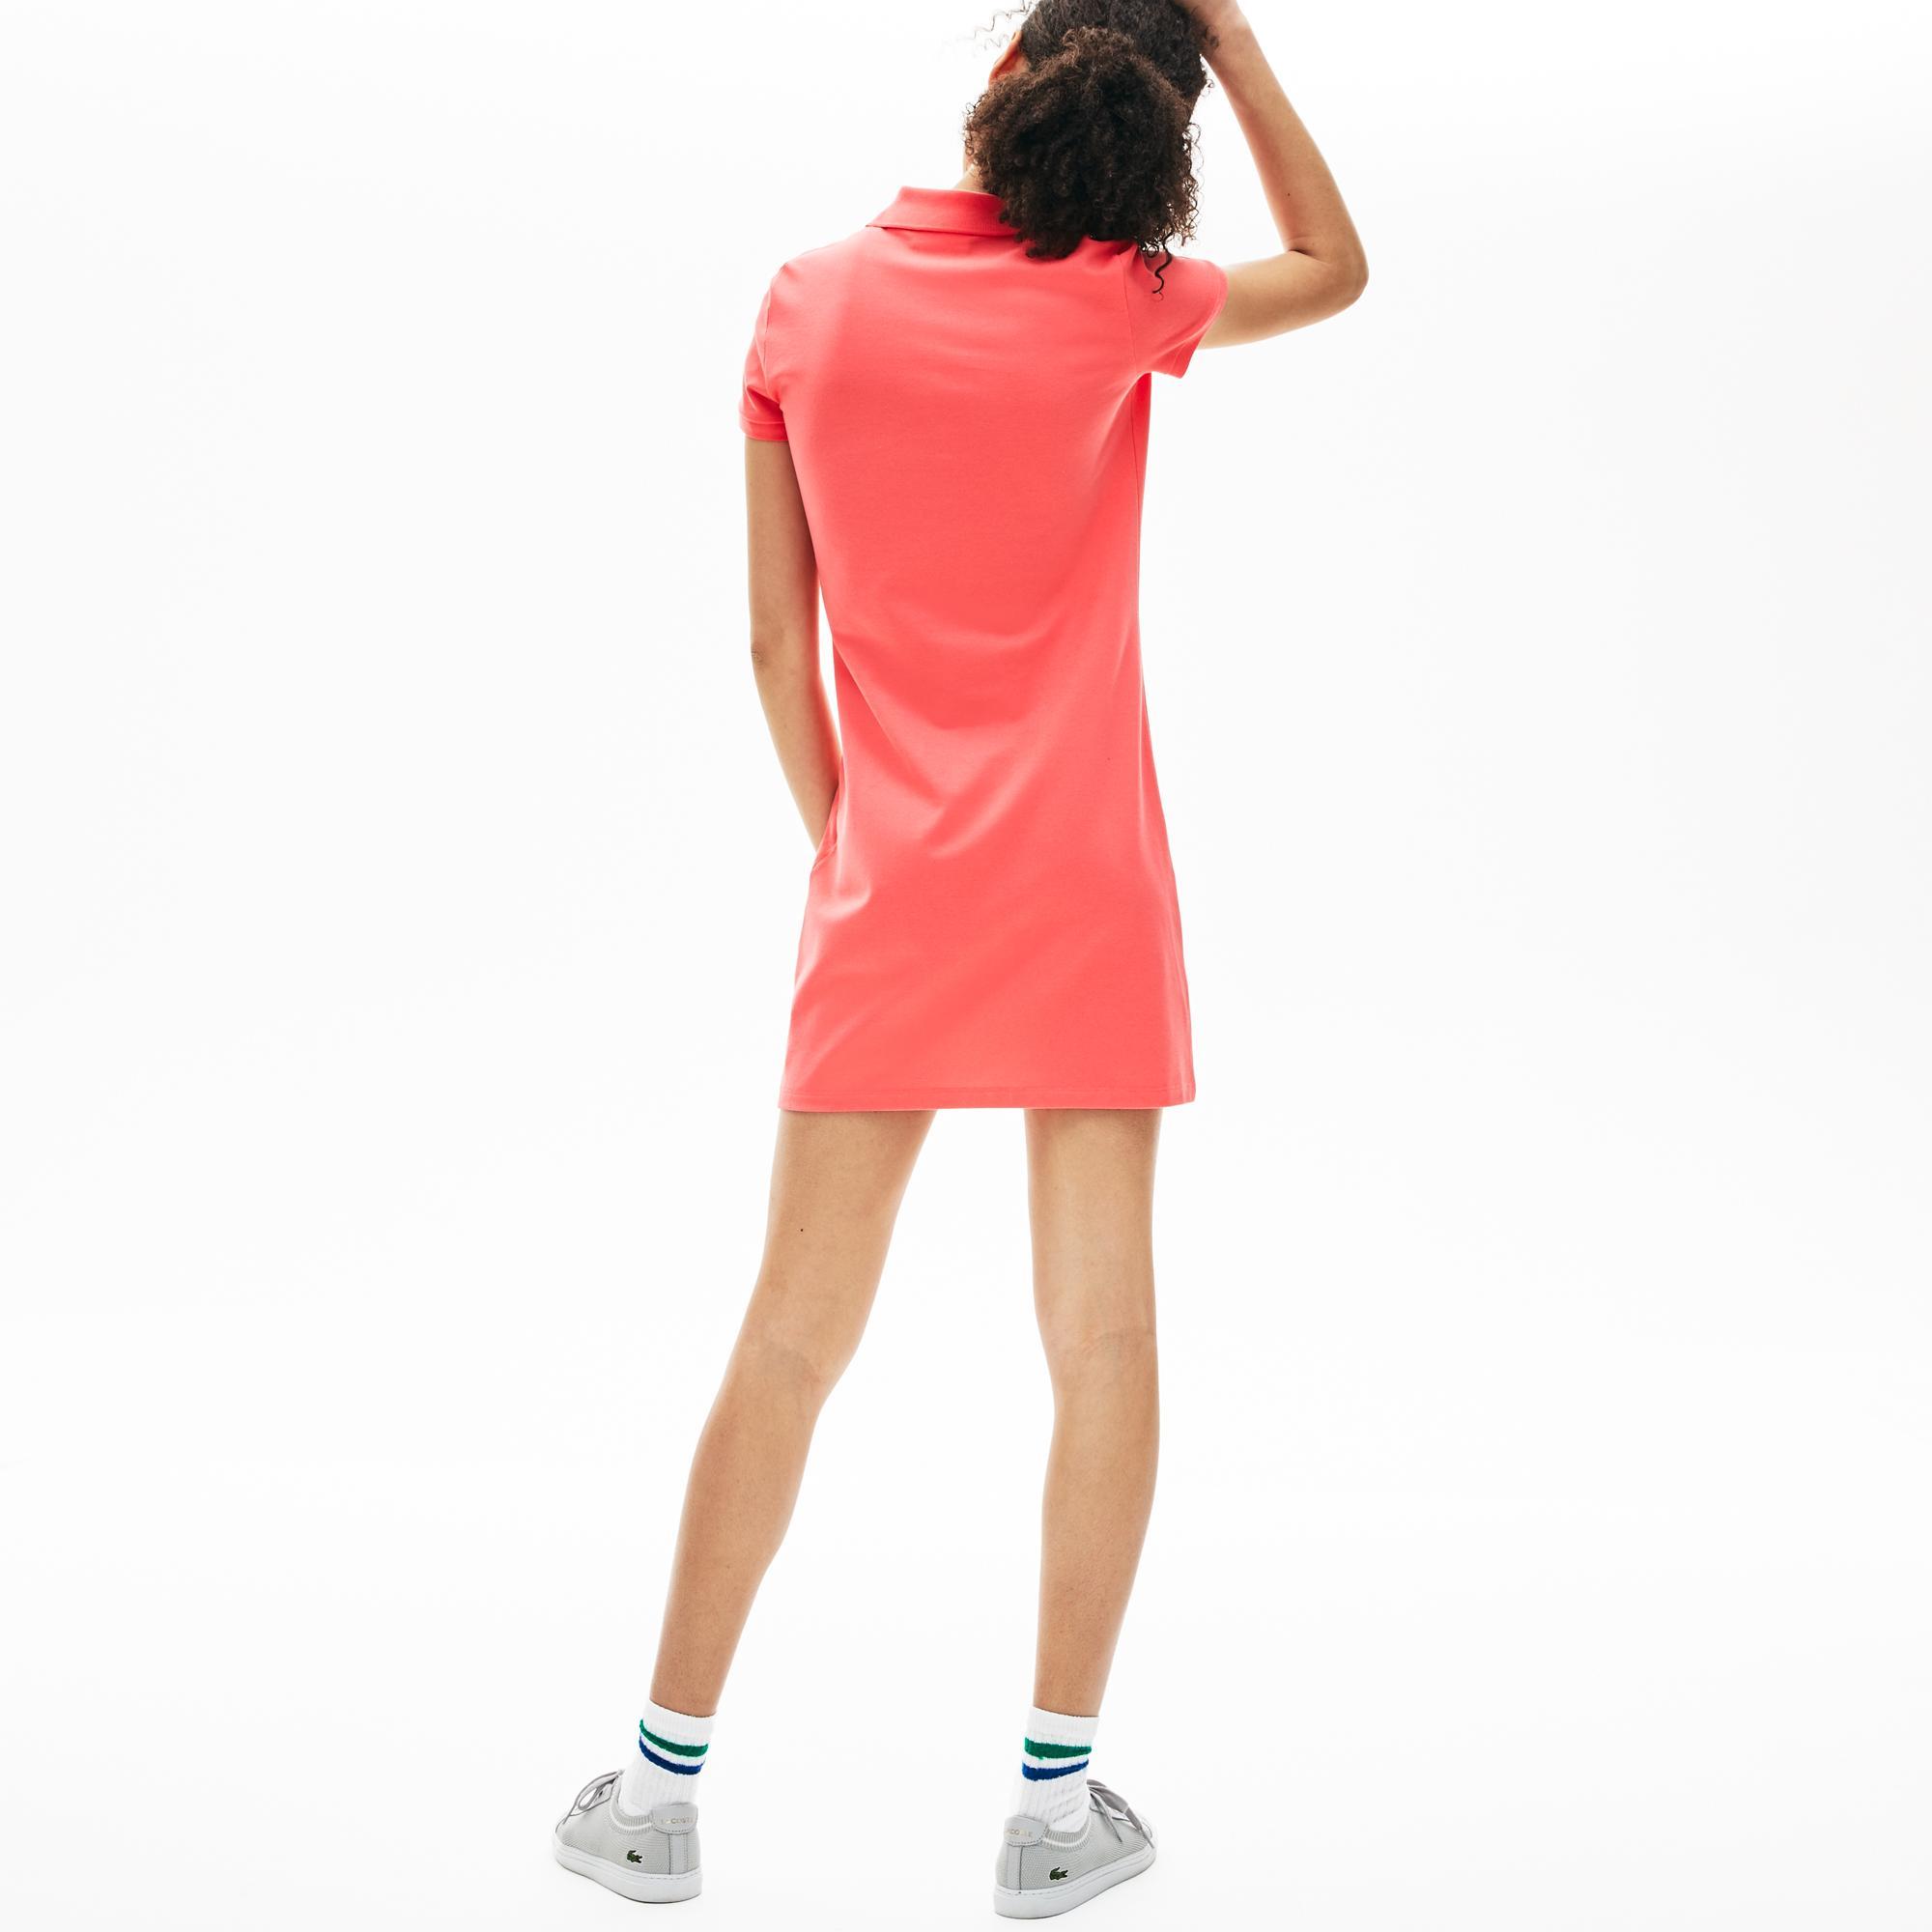 Lacoste Kadın Slim Fit Slim Fit Polo Yaka Pembe Elbise